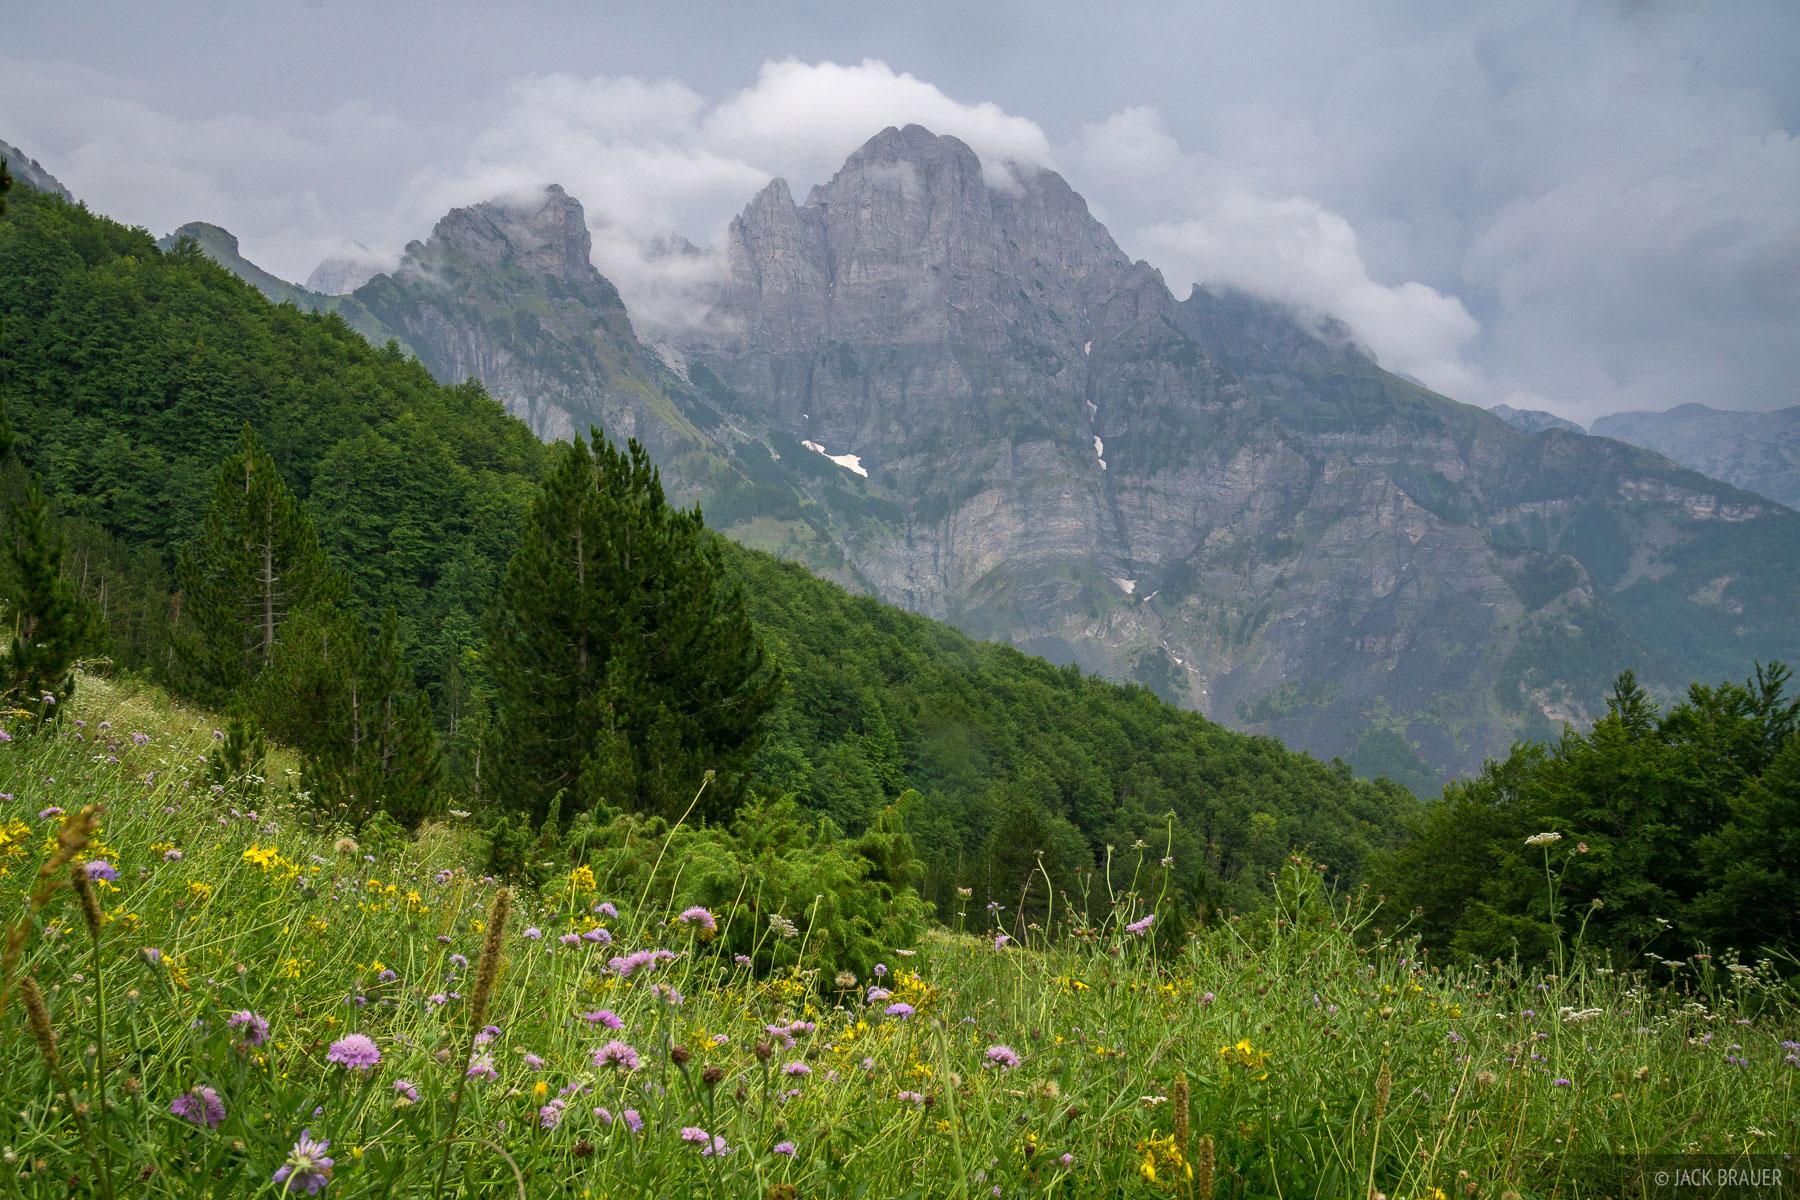 Misty mountain near Qafa e Valbones, the pass between Valbona and Thethi.